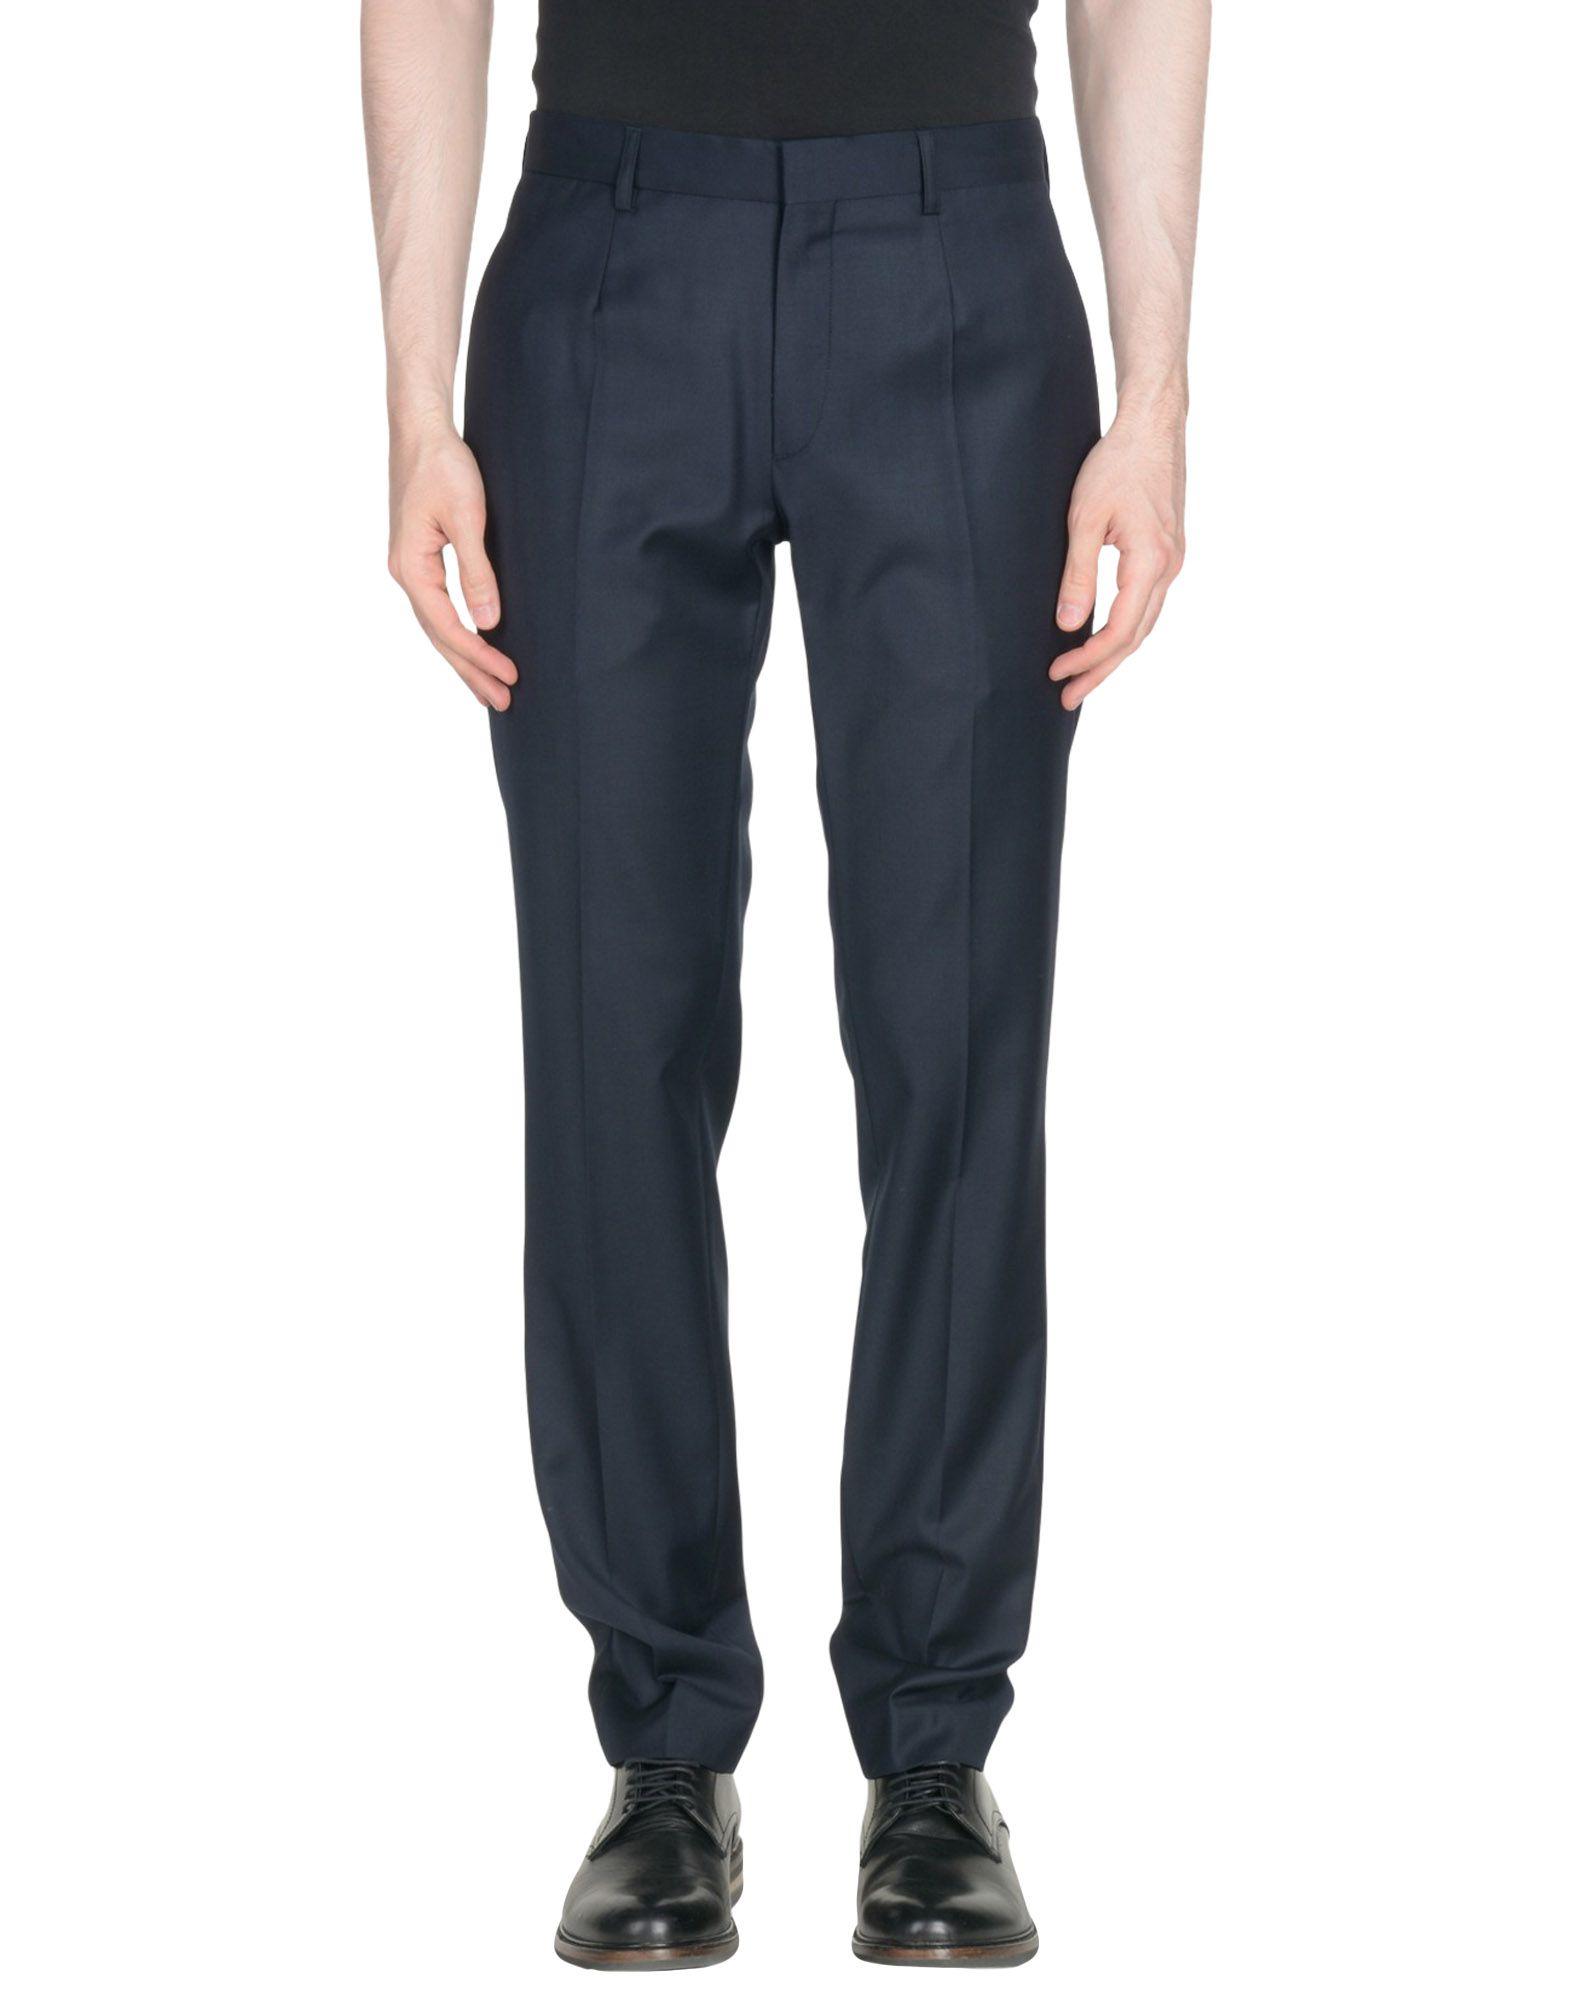 Pantalone Billtornade Donna - Acquista online su